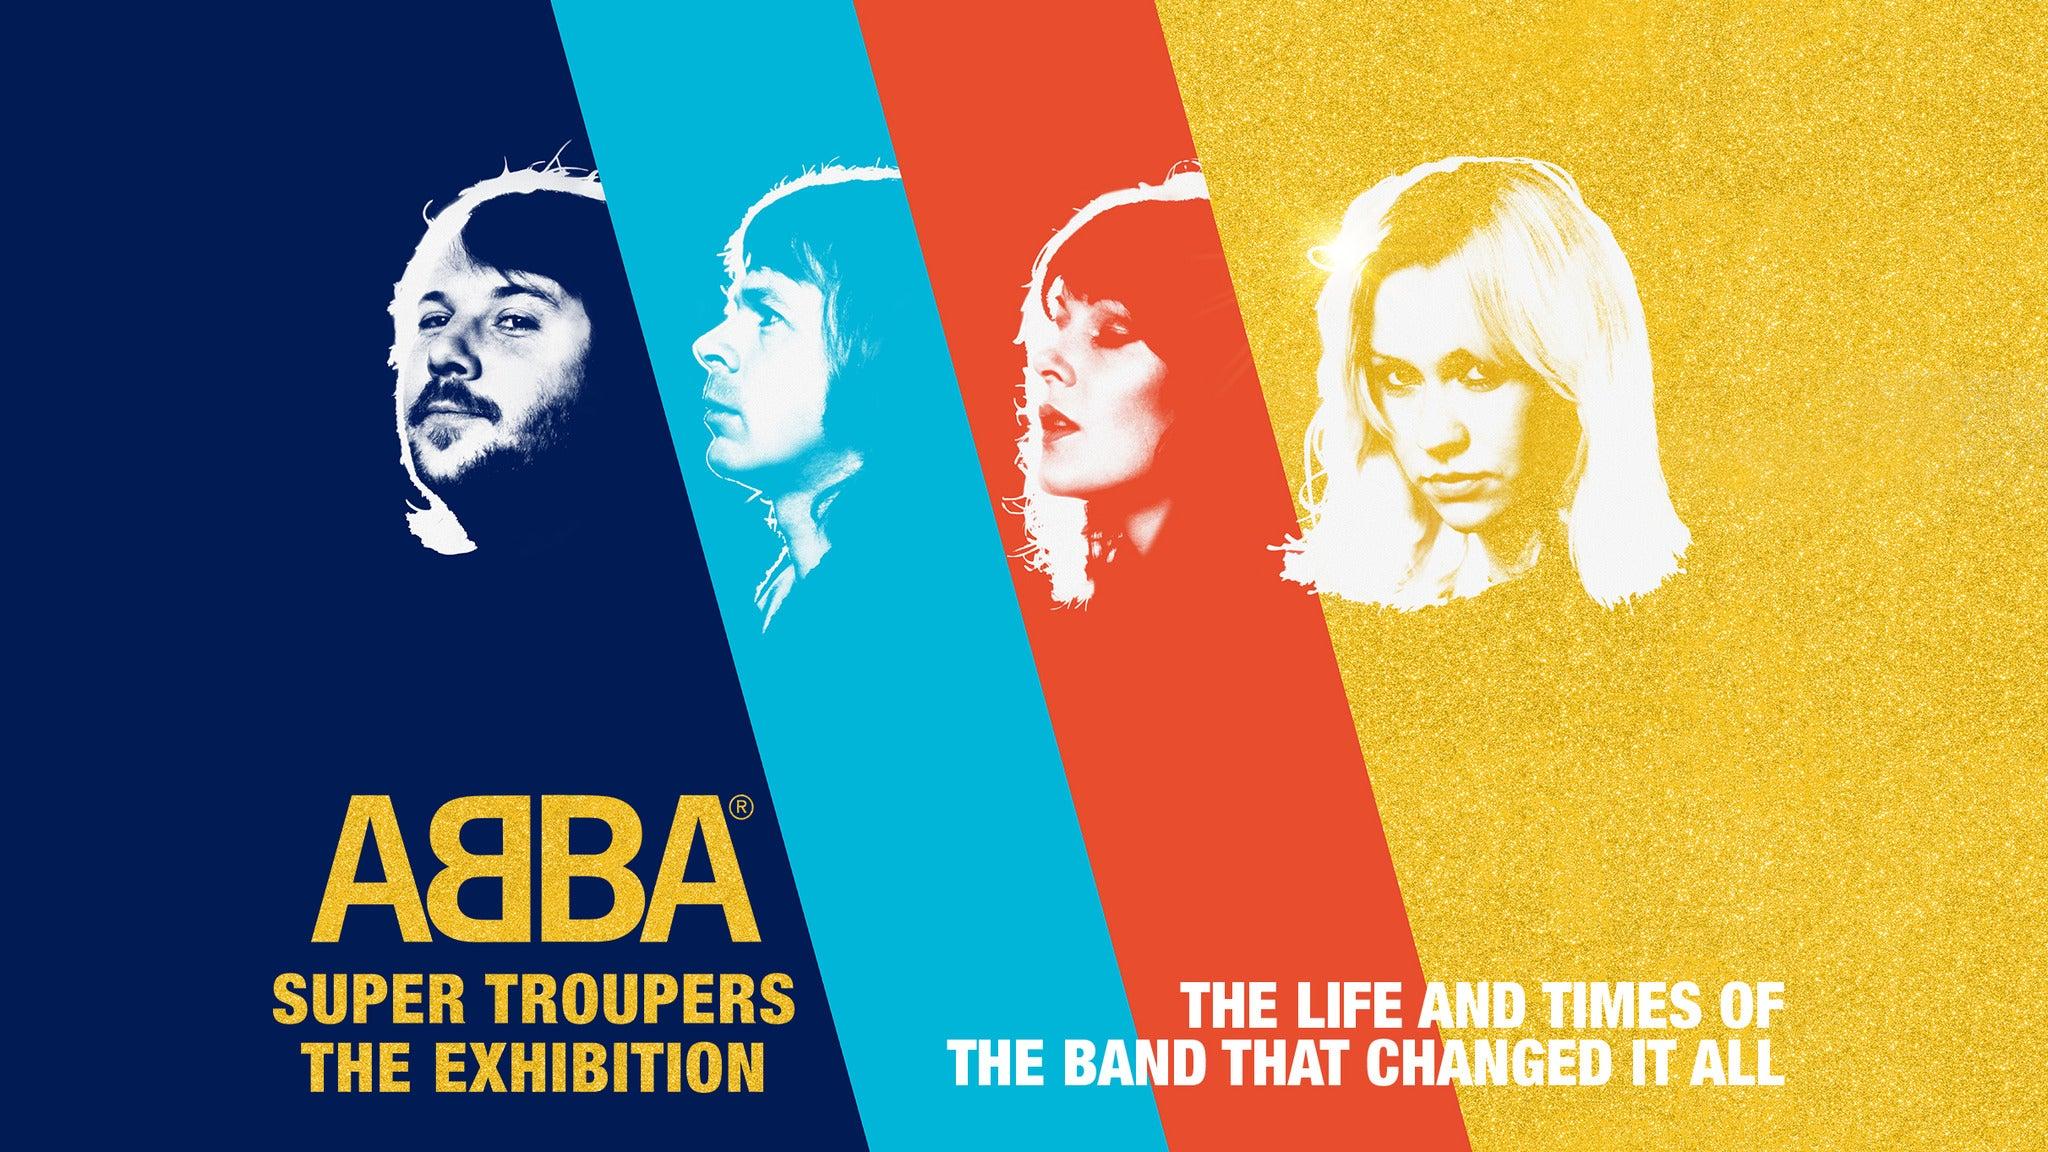 Abba: Super Troupers the Exhibition